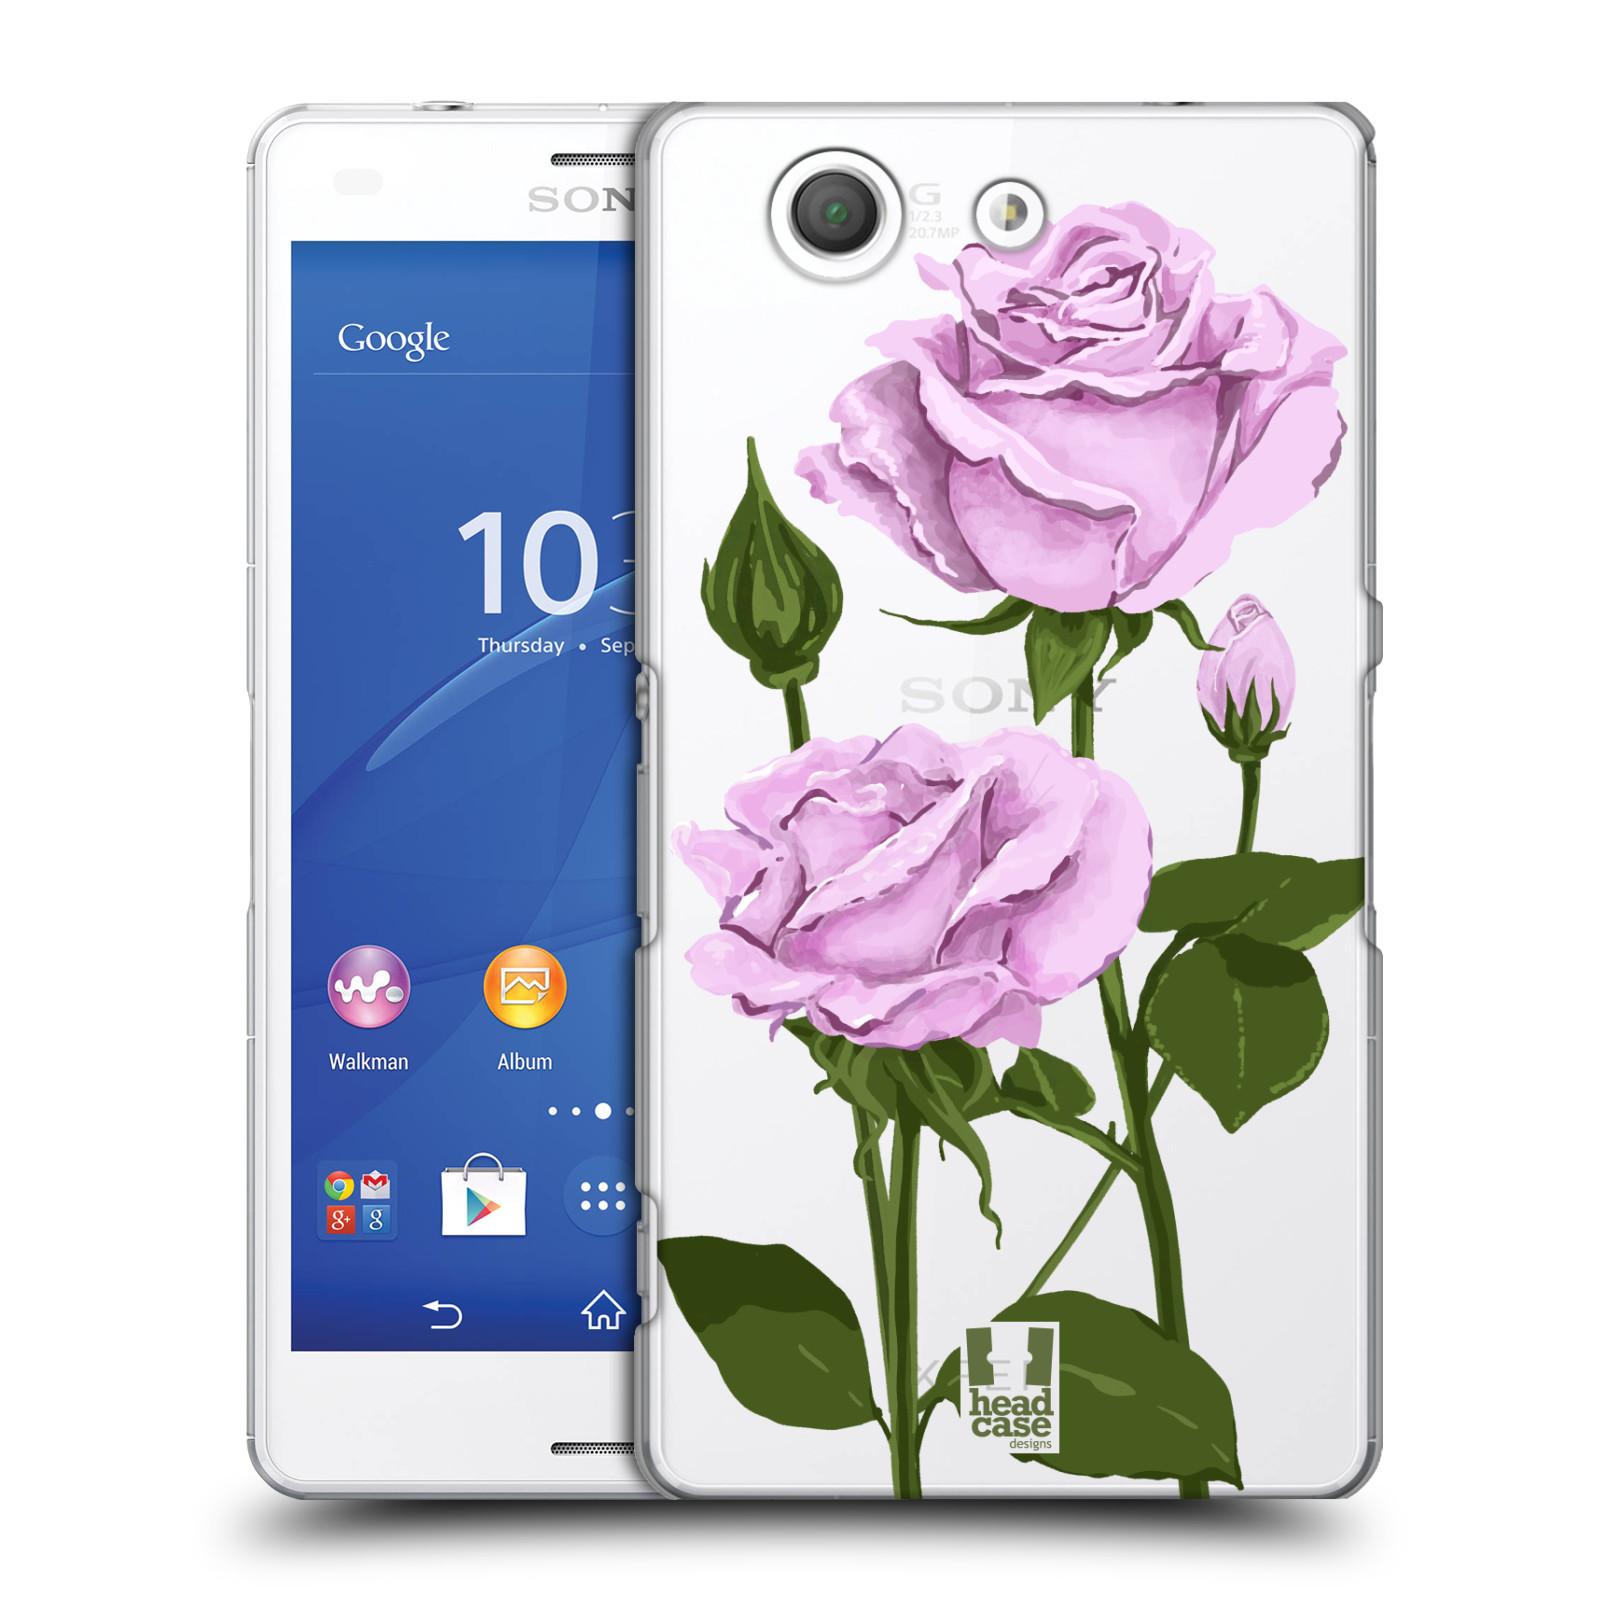 Pouzdro na mobil Sony Xperia Z3 COMPACT - HEAD CASE - květina růže růžová